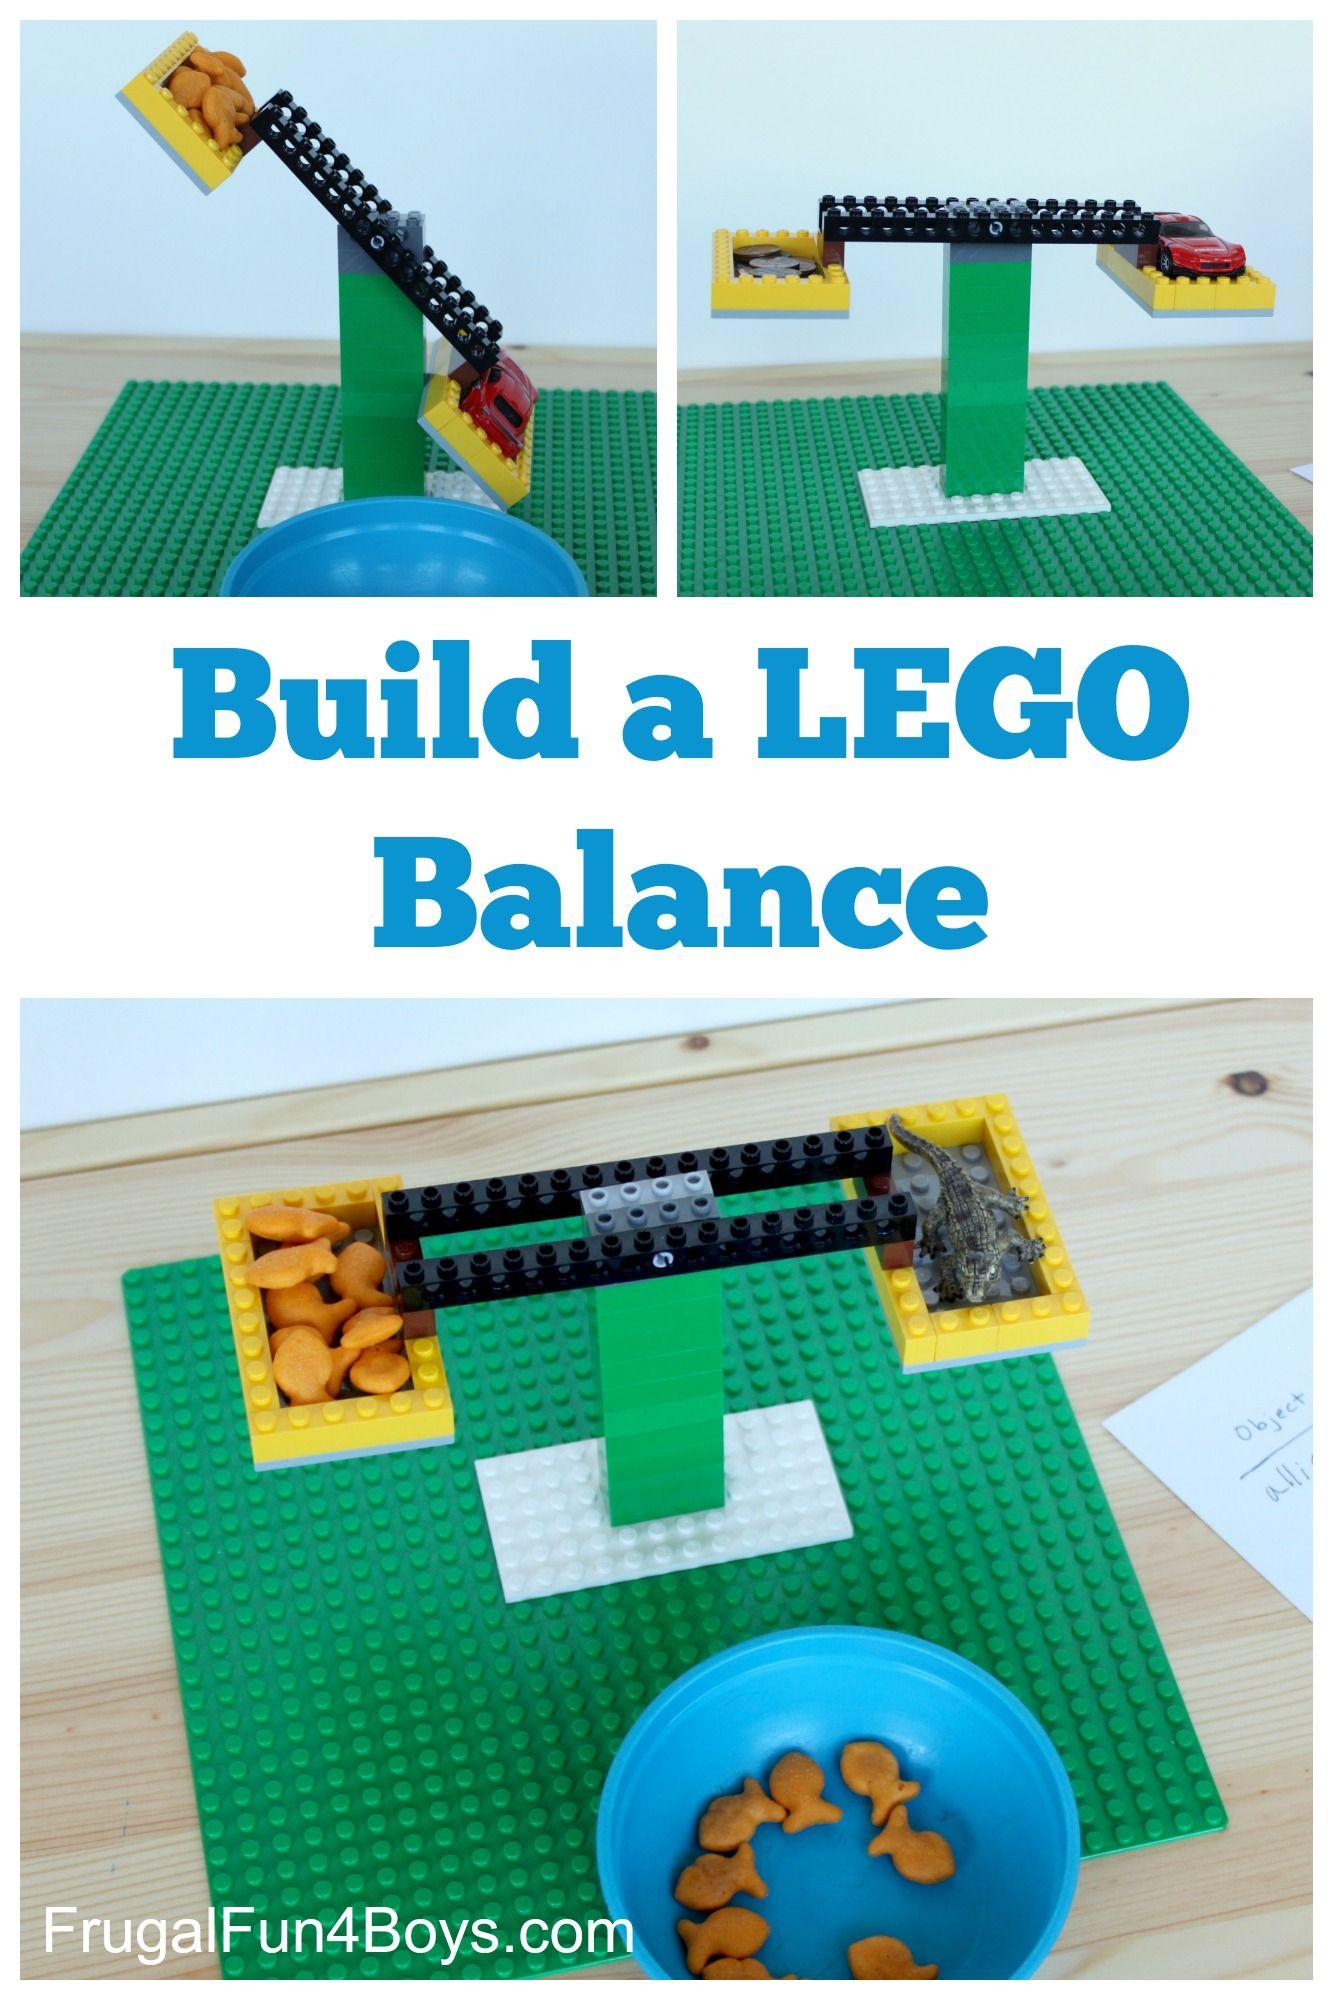 Build A Lego Balance